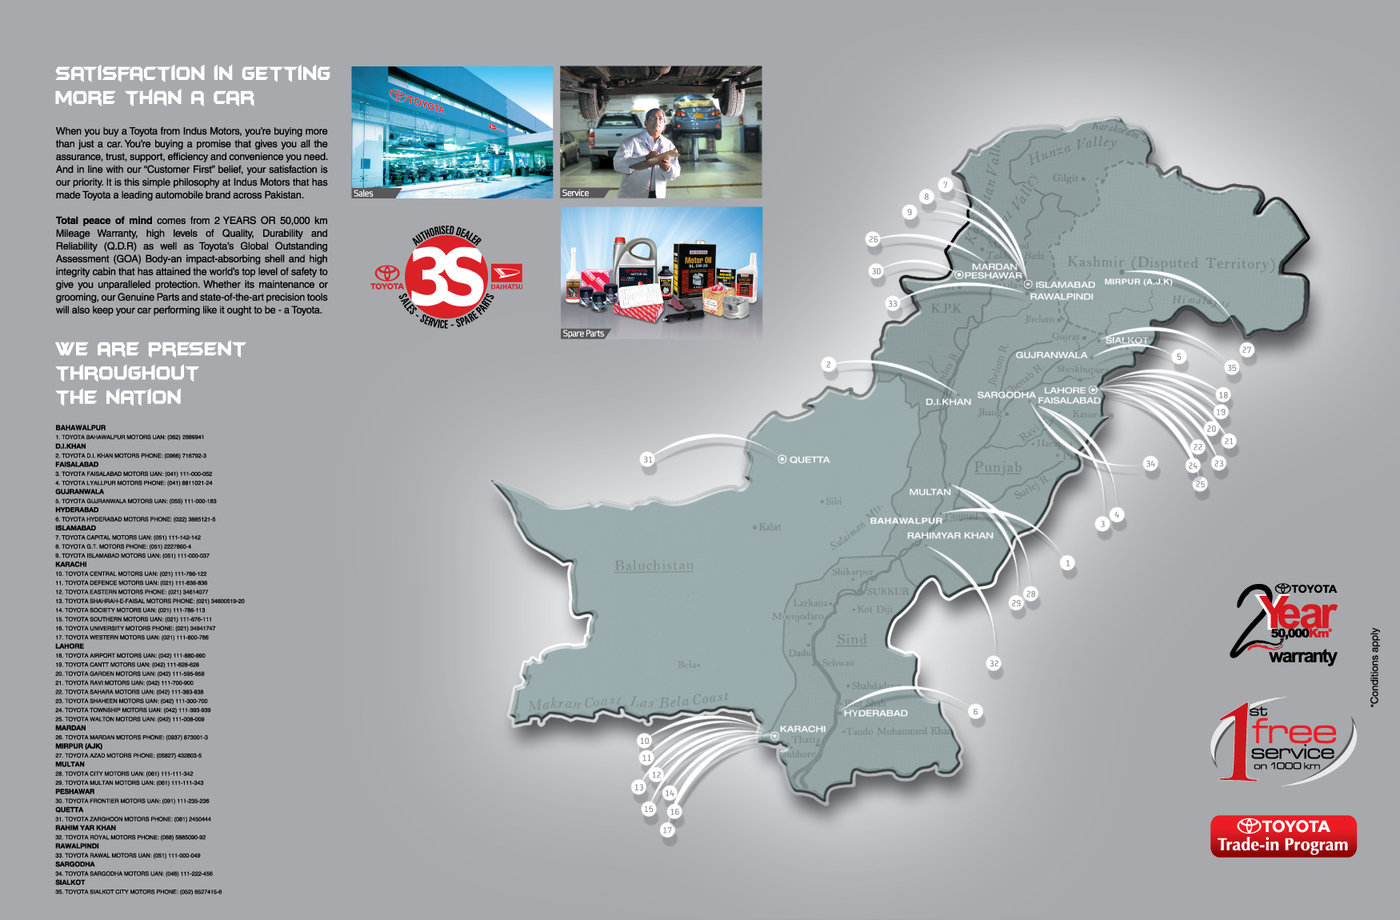 Brochure By Suhaib A Serai At Coroflot Com